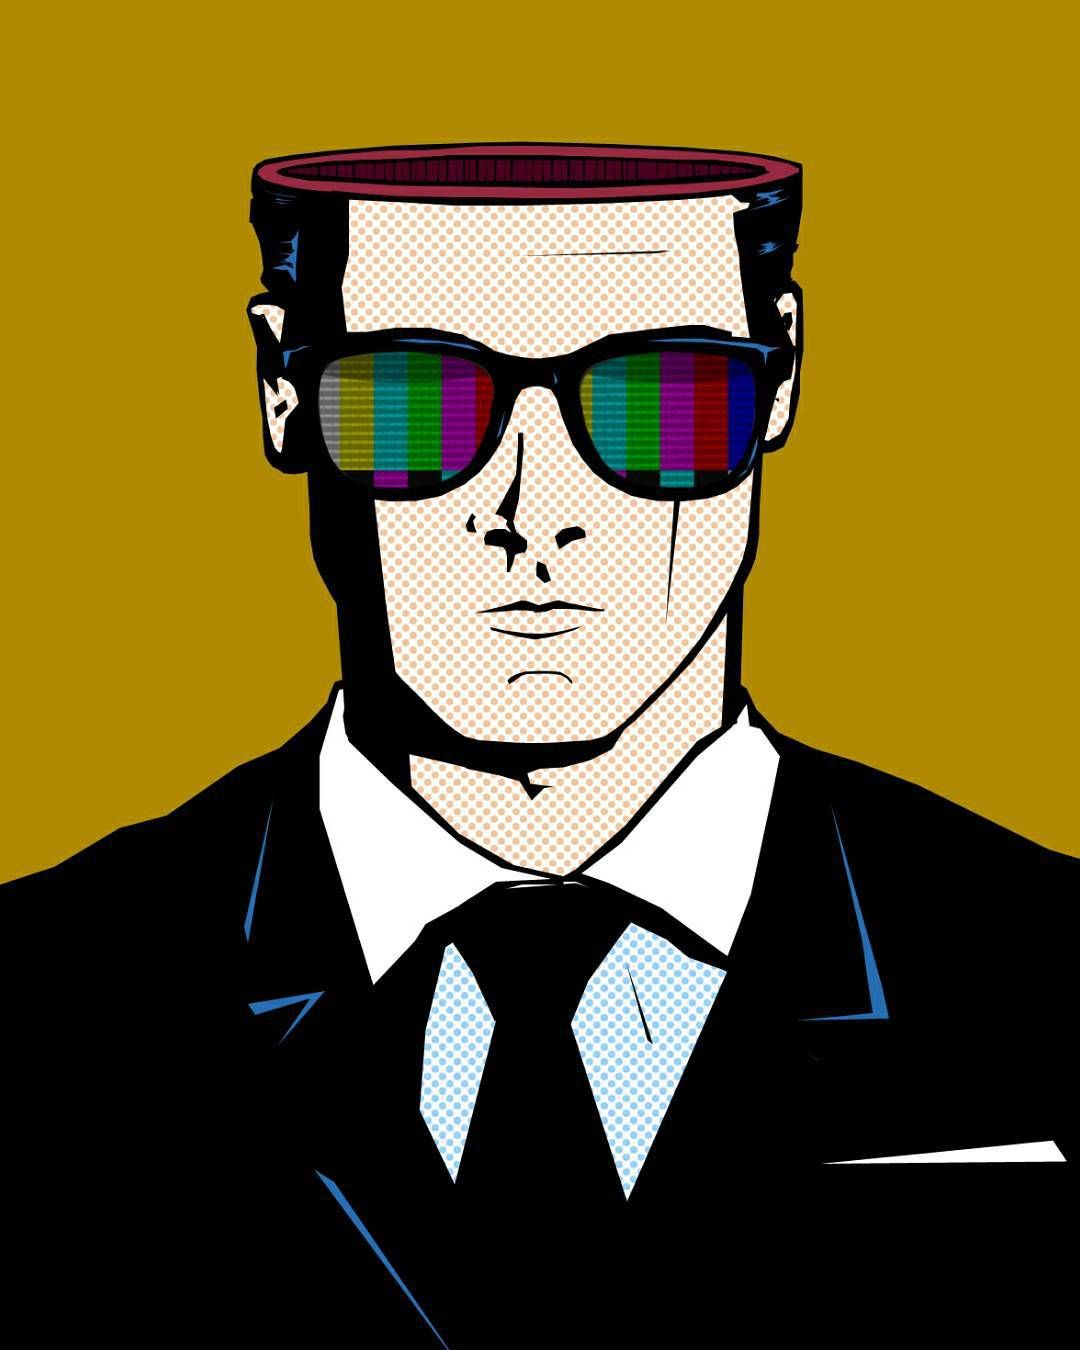 #art#artsy#artist#draw#drawing#pencil#color#colors#illustration#arte#artwork#black#blackandwhite#colour#creative#ink#myart#painting#paintings#paint#talentedpeopleinc#sqr16#sqr16art#propaganda#society#tv#brainless#sunglasses#suitandtie by squaresixteen